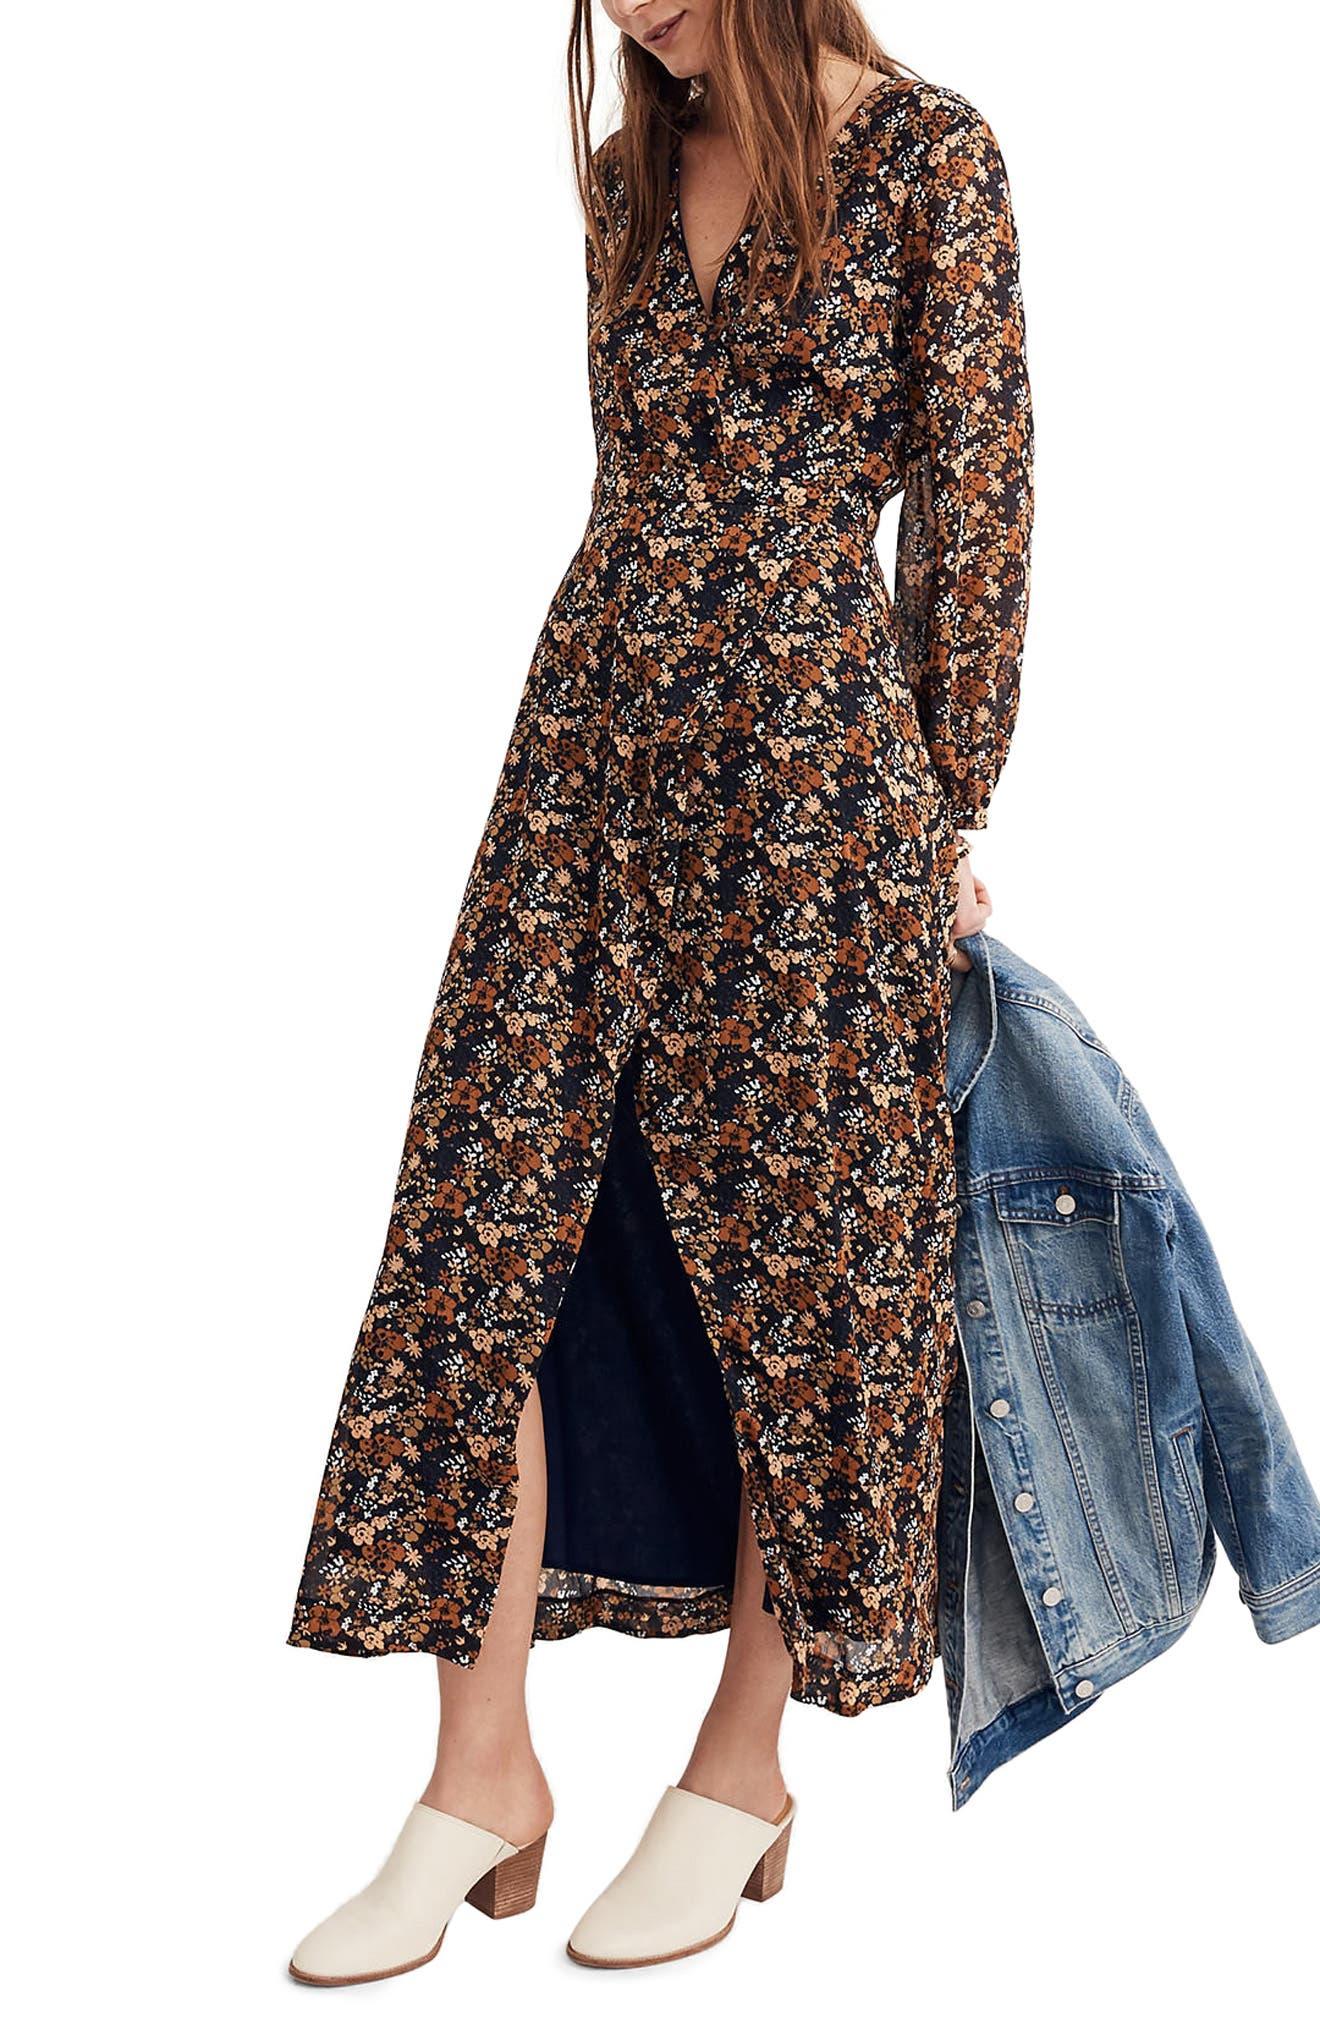 Nightflower Maxi Dress,                             Main thumbnail 1, color,                             Woodland Floral